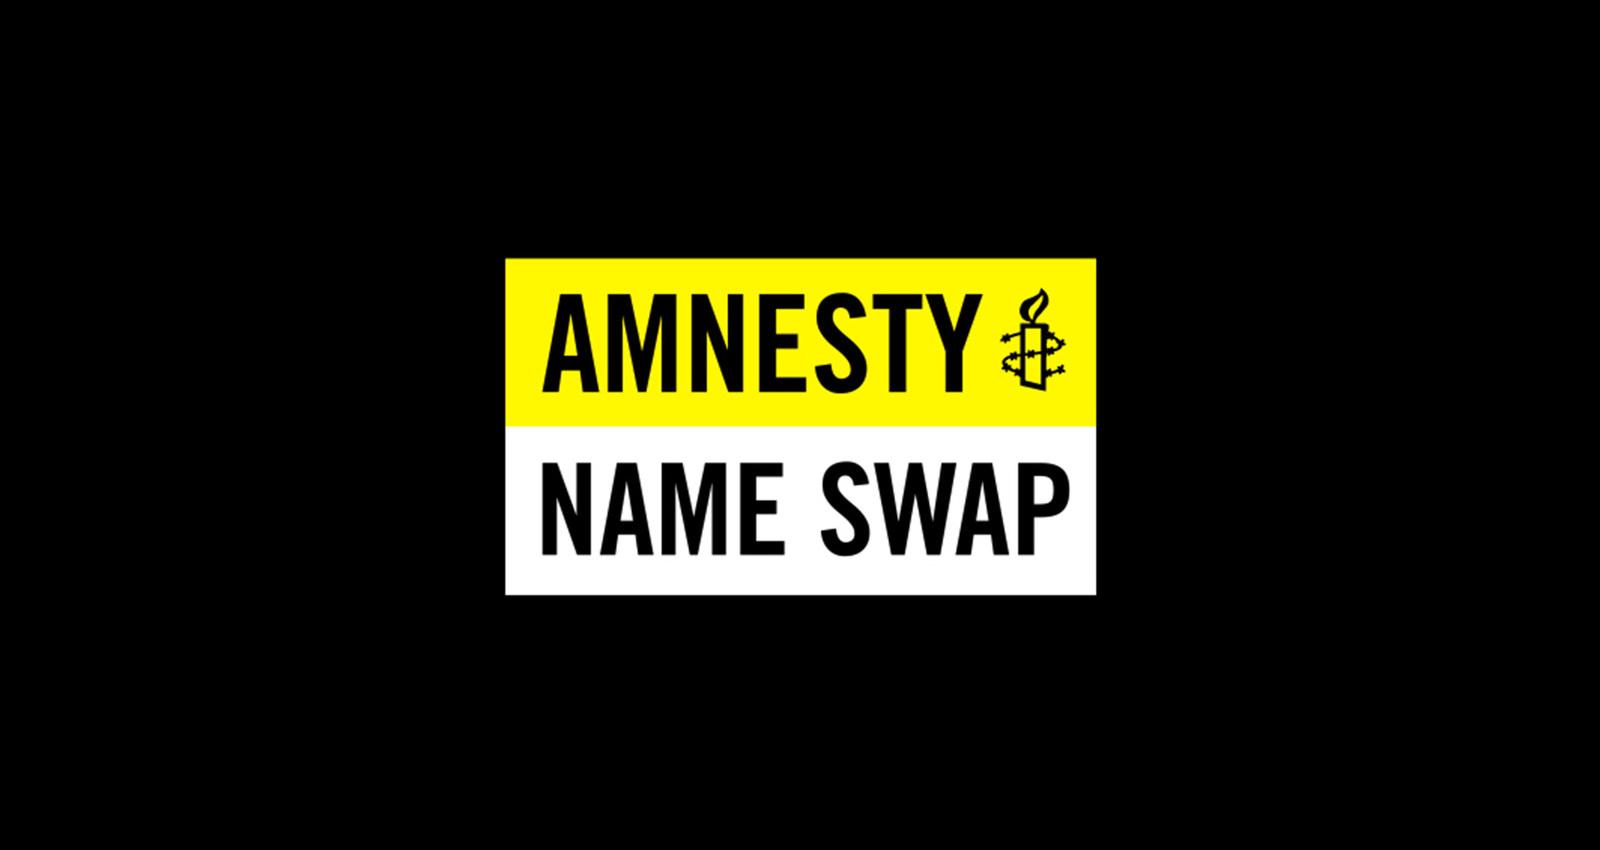 Name Swap